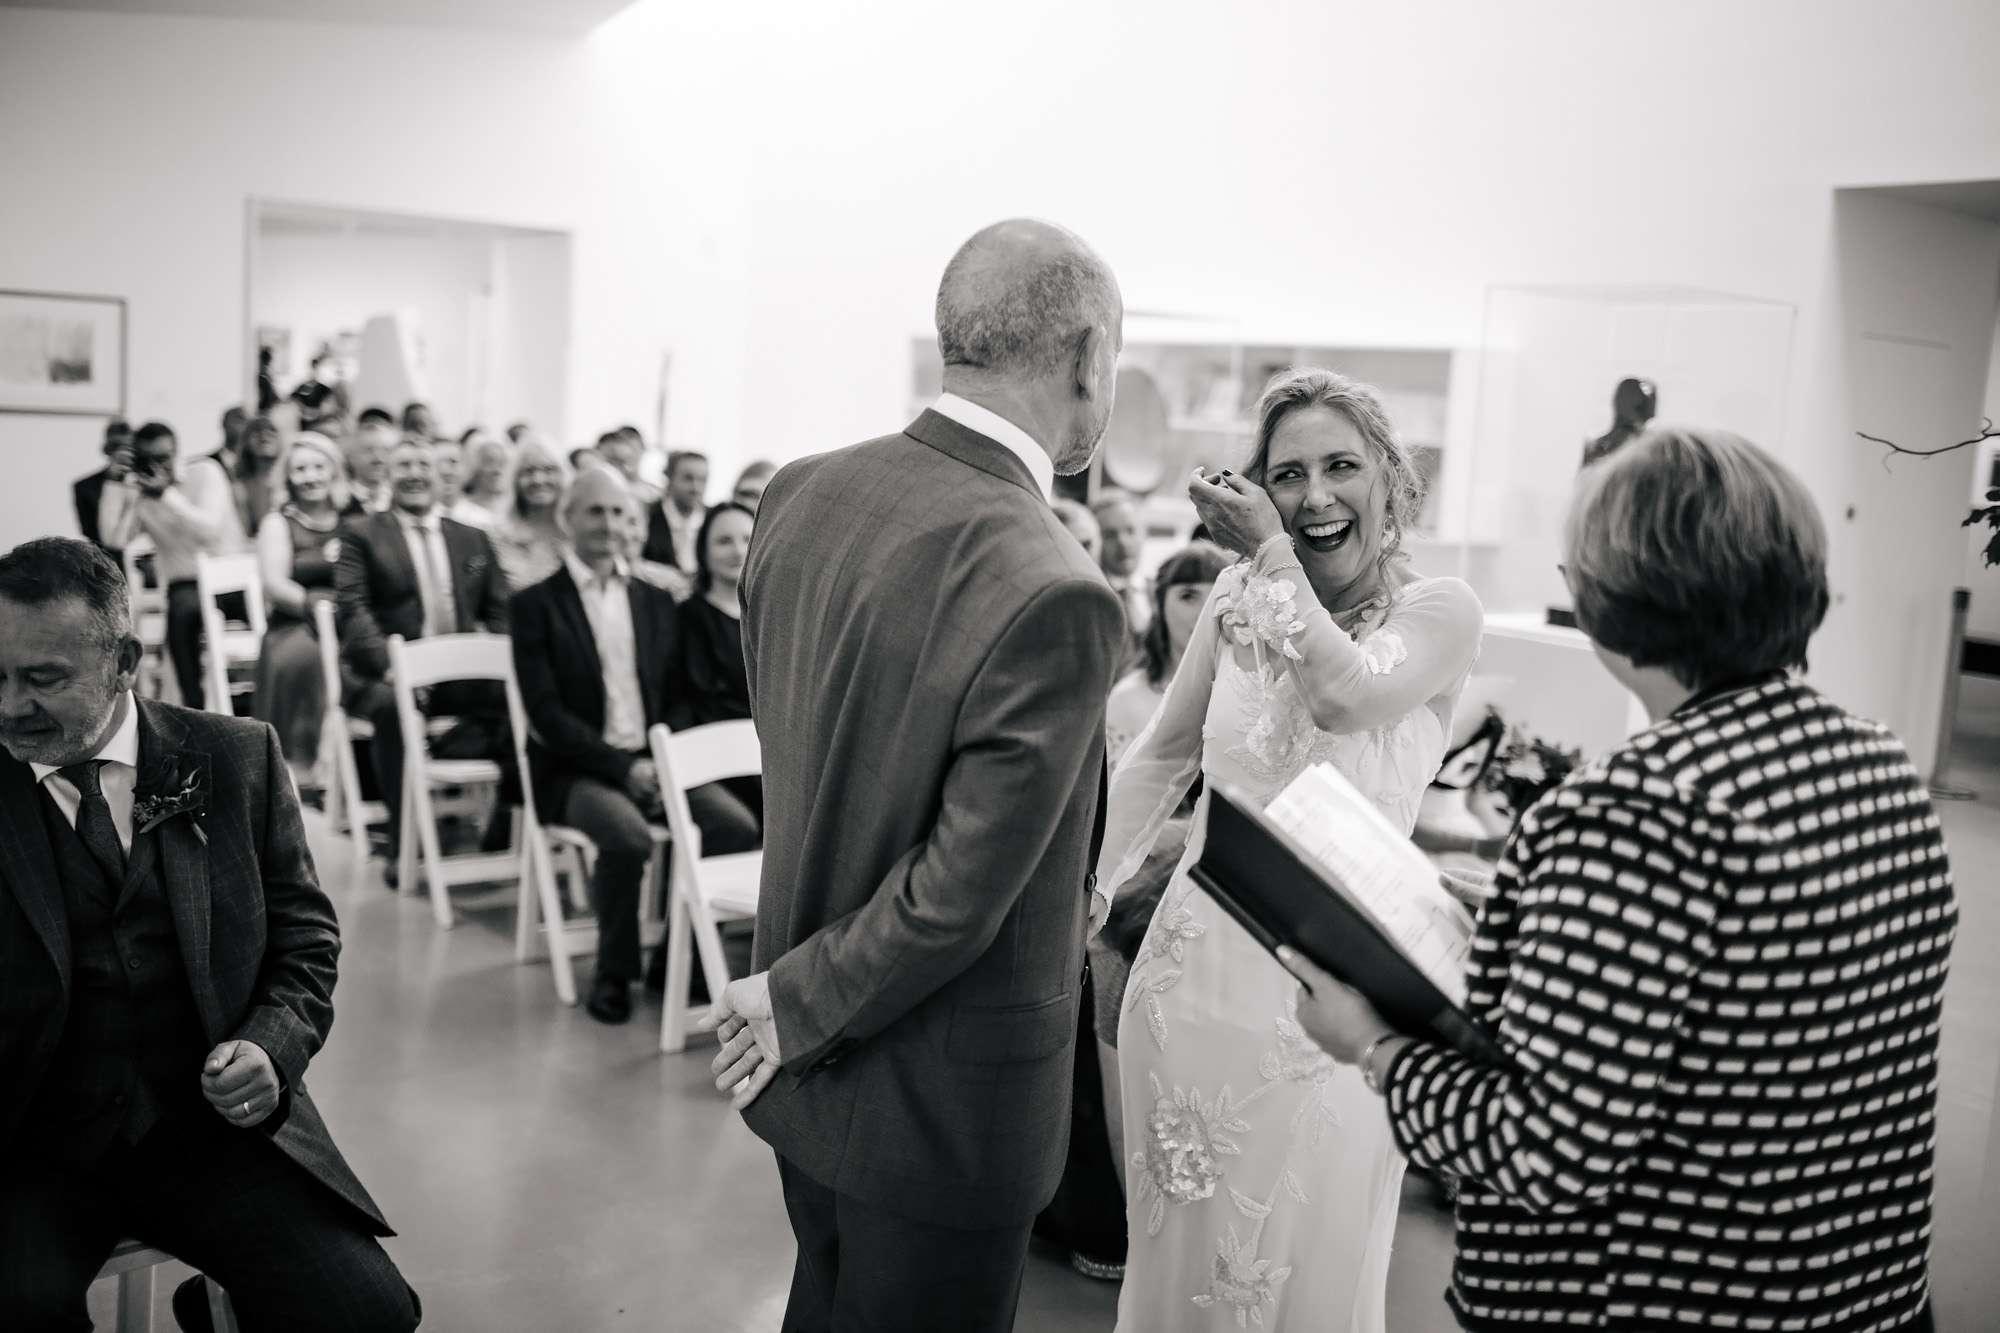 Hepworth Art Gallery wedding in Wakefield